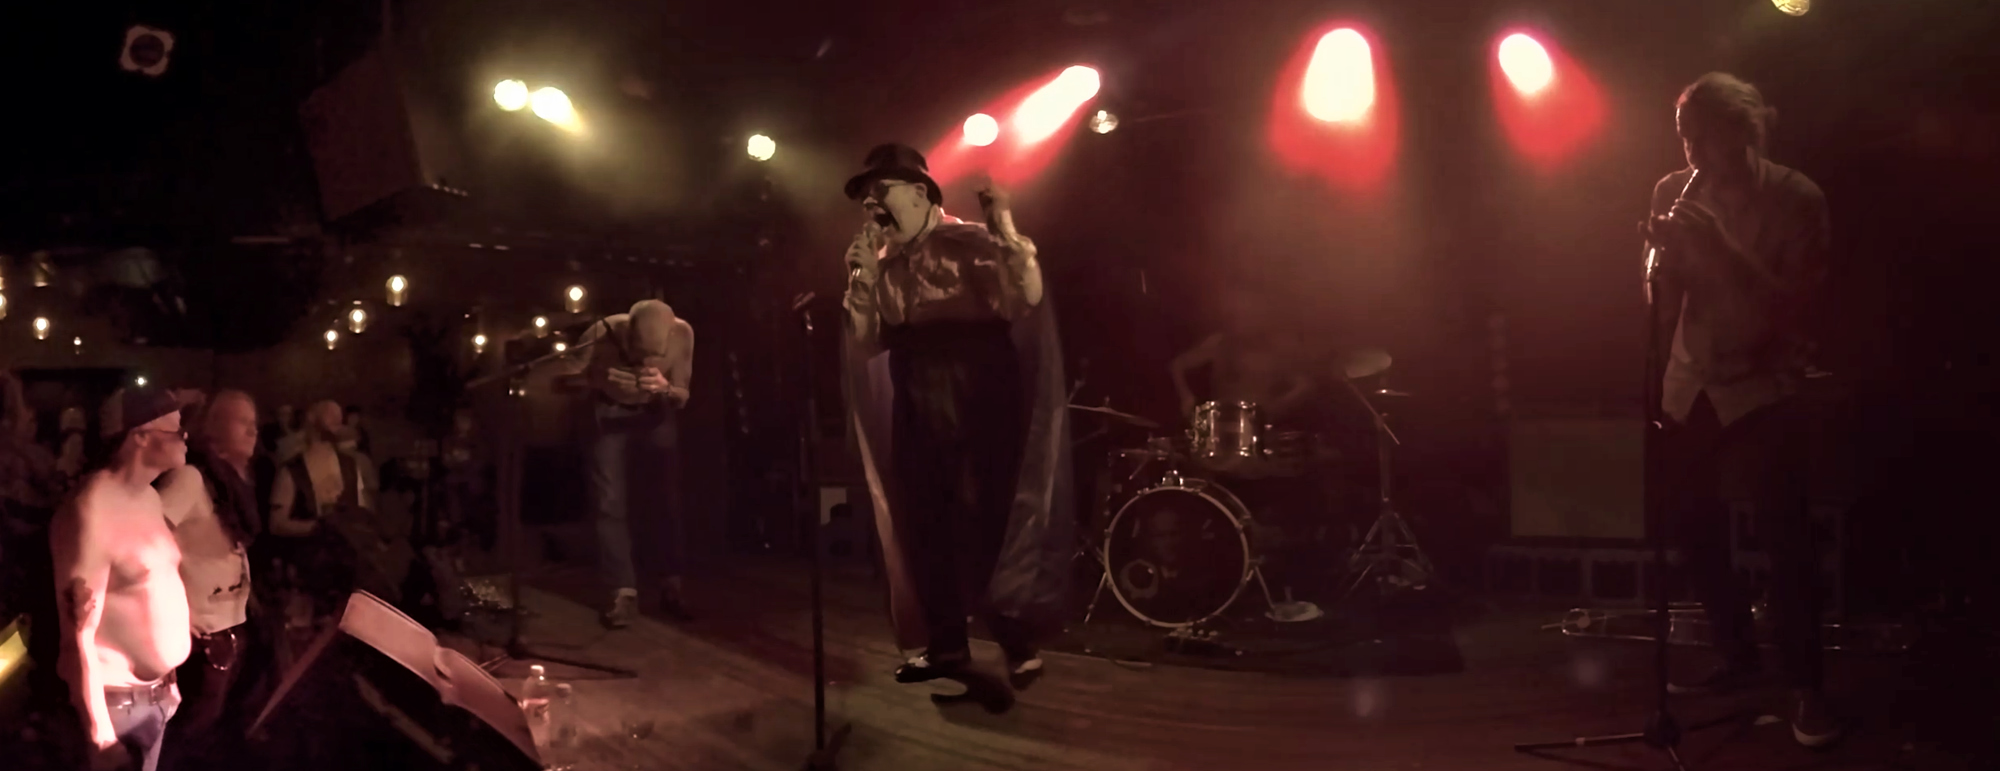 KALEVI HELVETTI'S LIVE PERFORMANCE AT CLUB KUUDES LINJA   , Helsinki, Finland